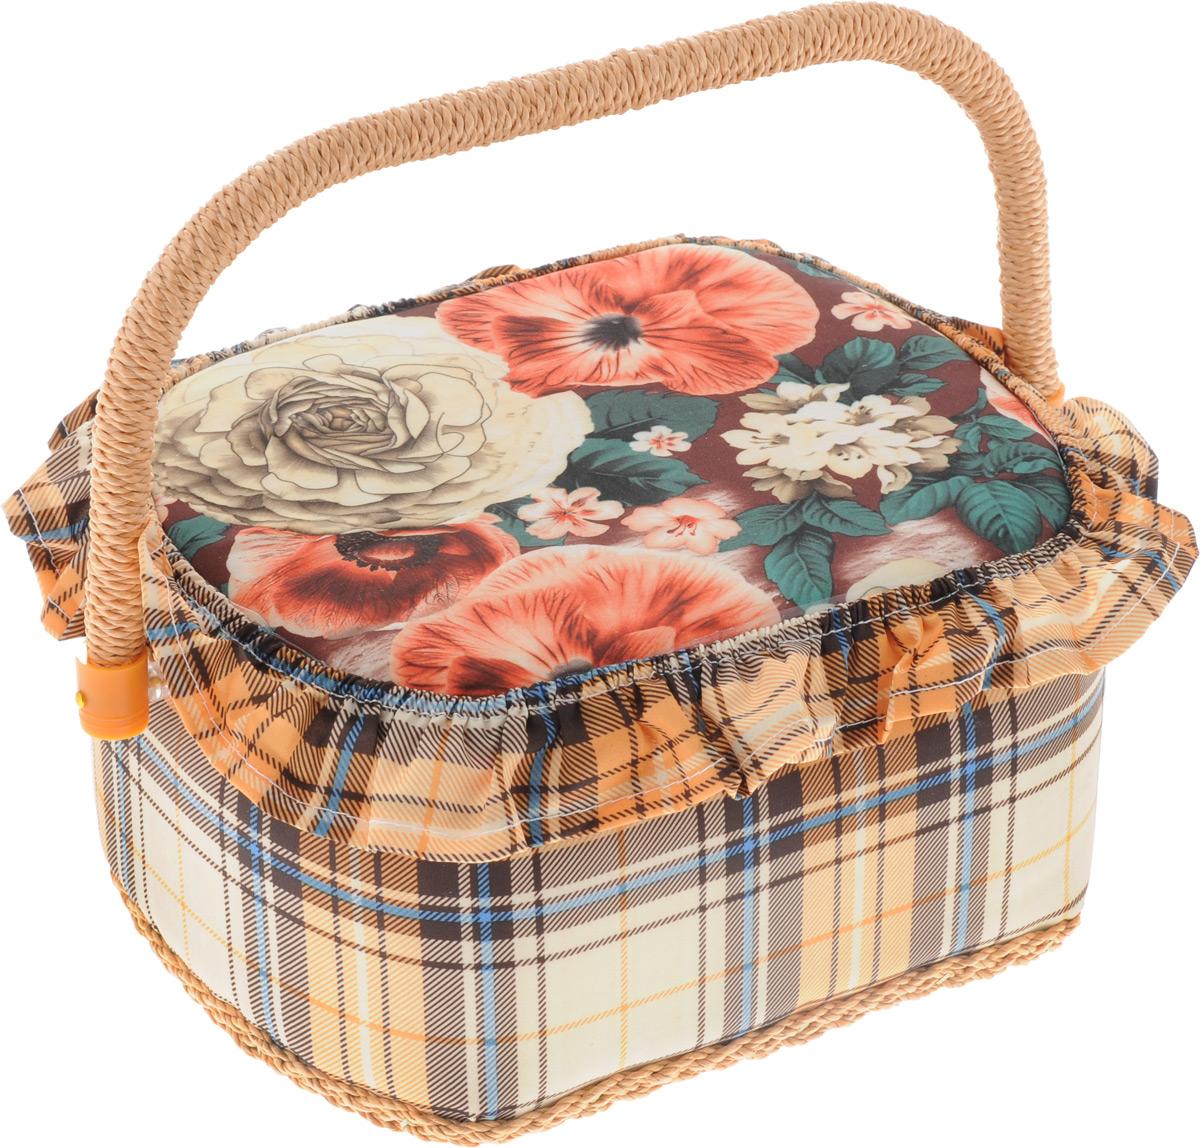 Шкатулка для рукоделия Bestex Цветы, 23 х 18 х 12 см шкатулка для рукоделия rto цветочки с вкладышем 23 х 23 х 14 5 см